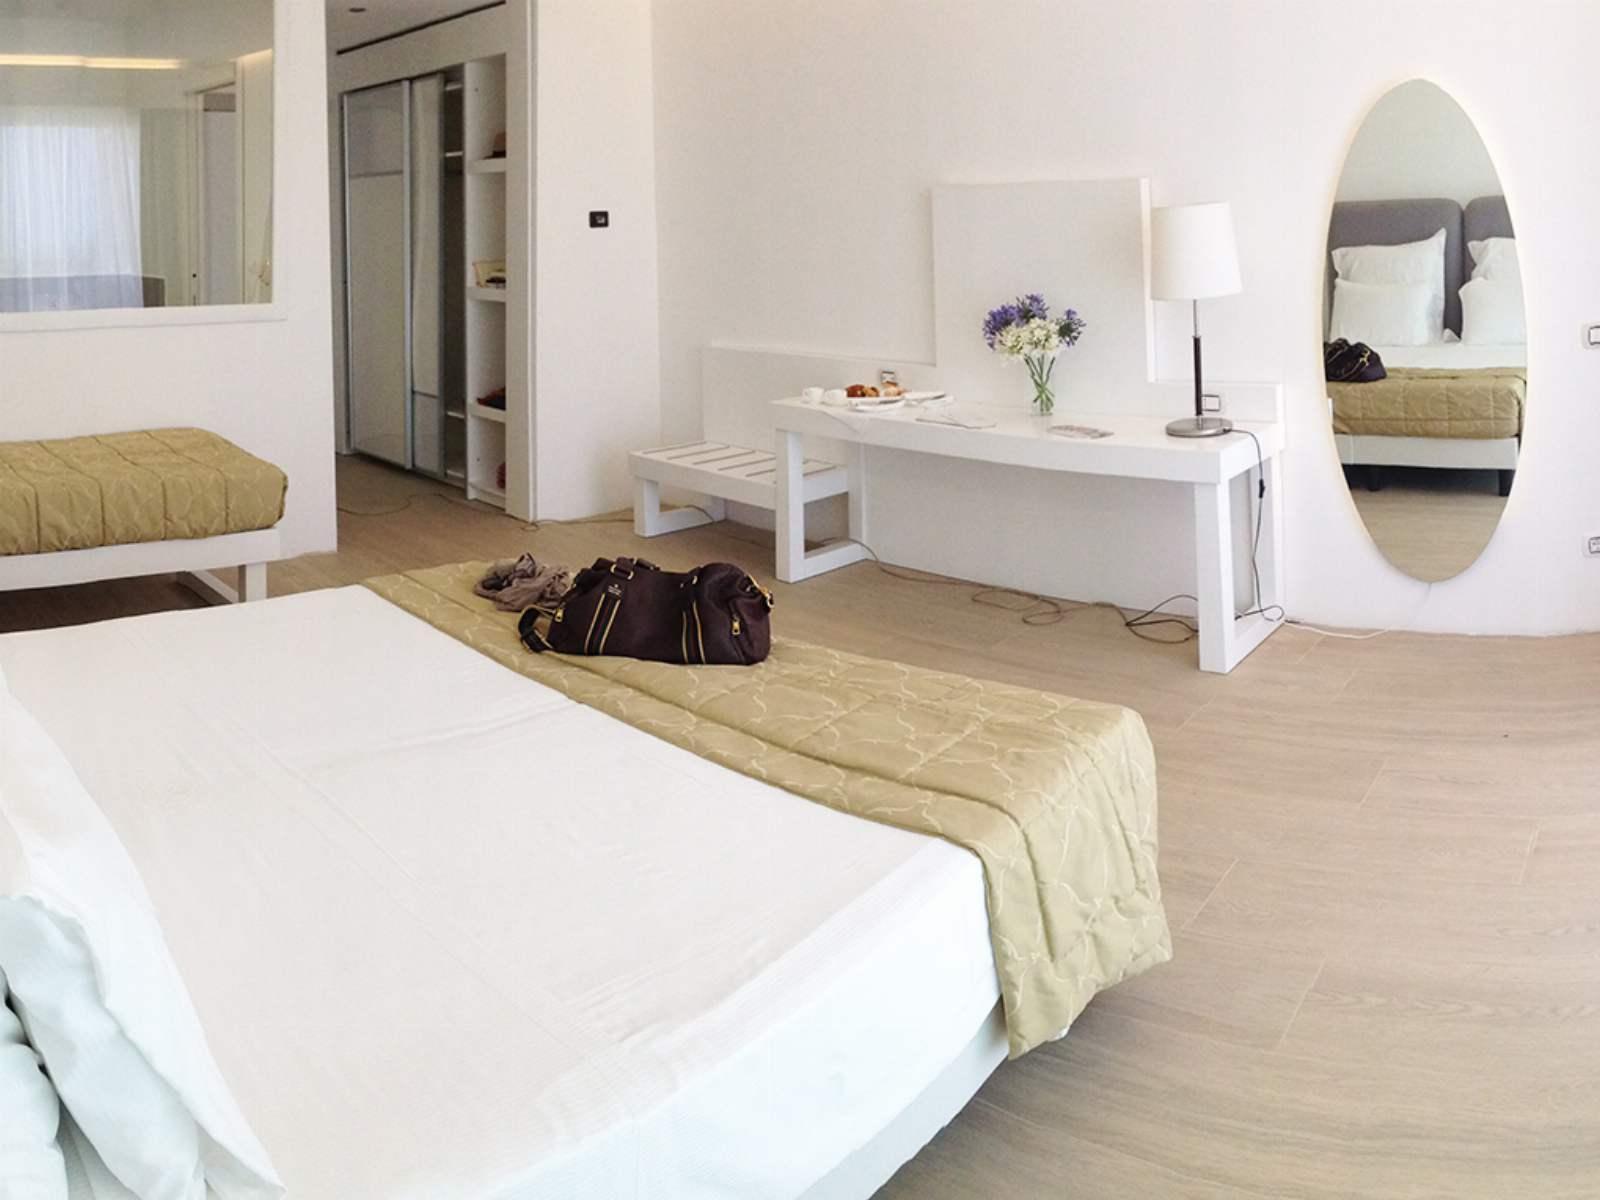 Infinity Resort & Spa: room / property / locale photo. Image 3